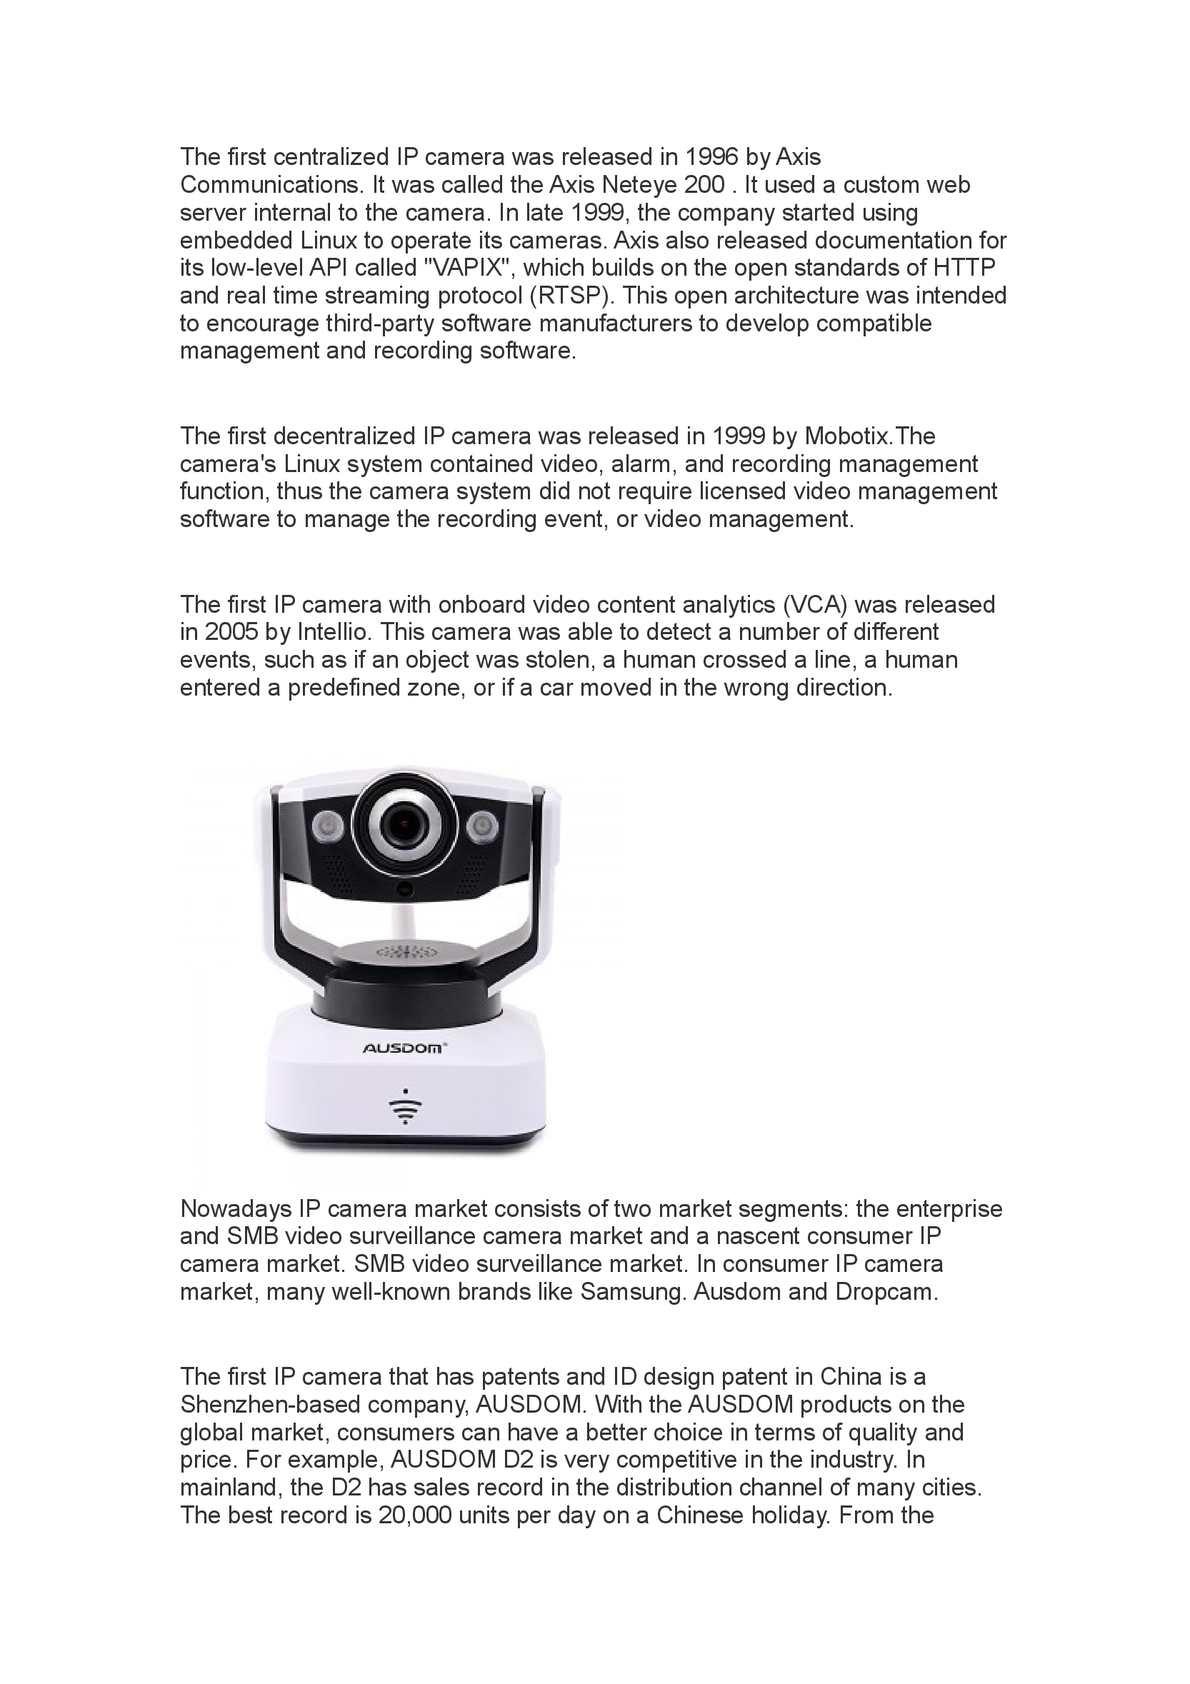 Calaméo - The History of IP Camera